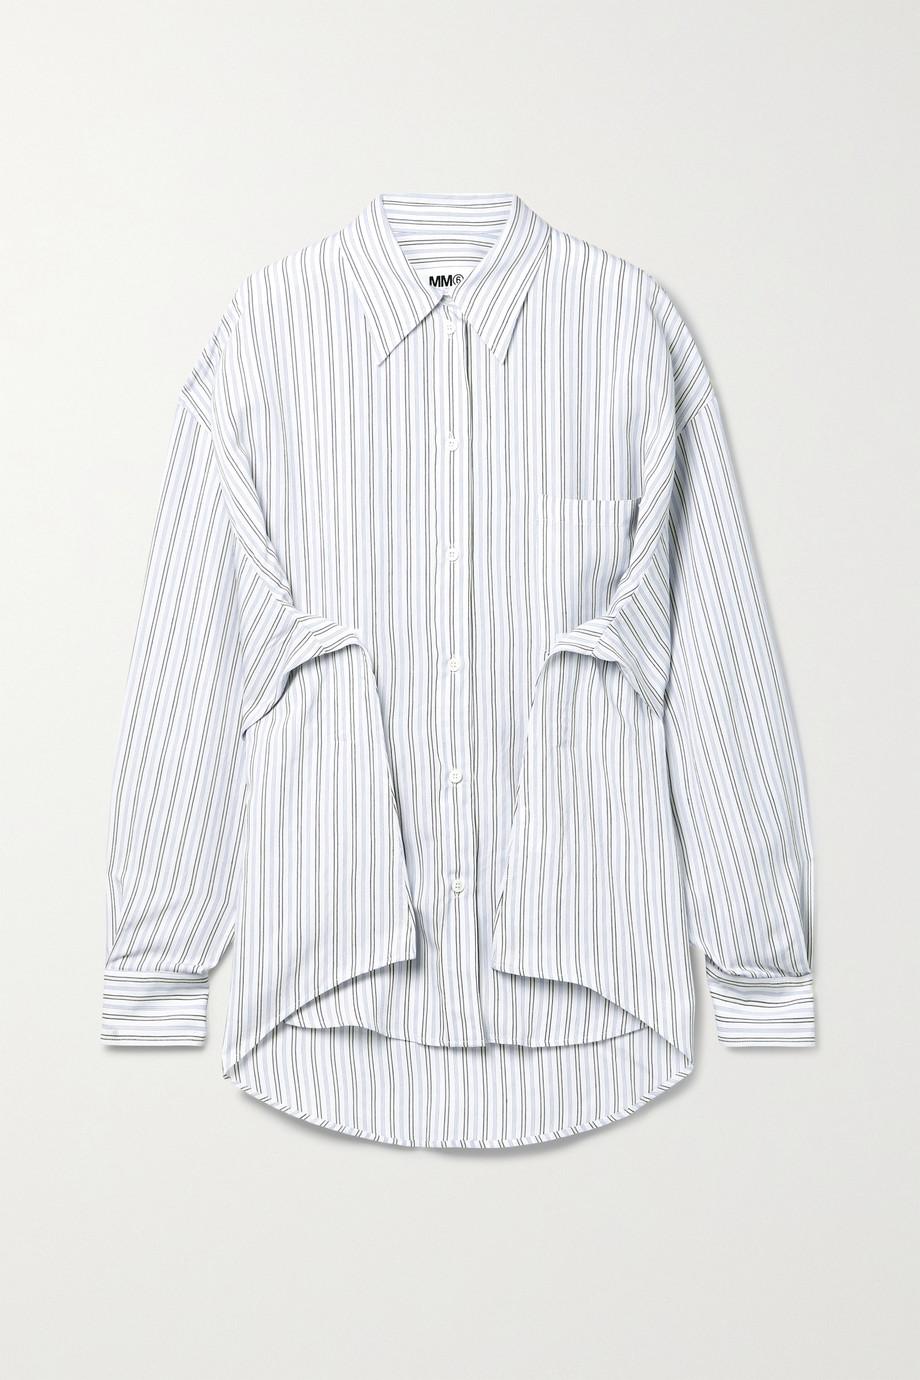 MM6 Maison Margiela 细条纹府绸衬衫